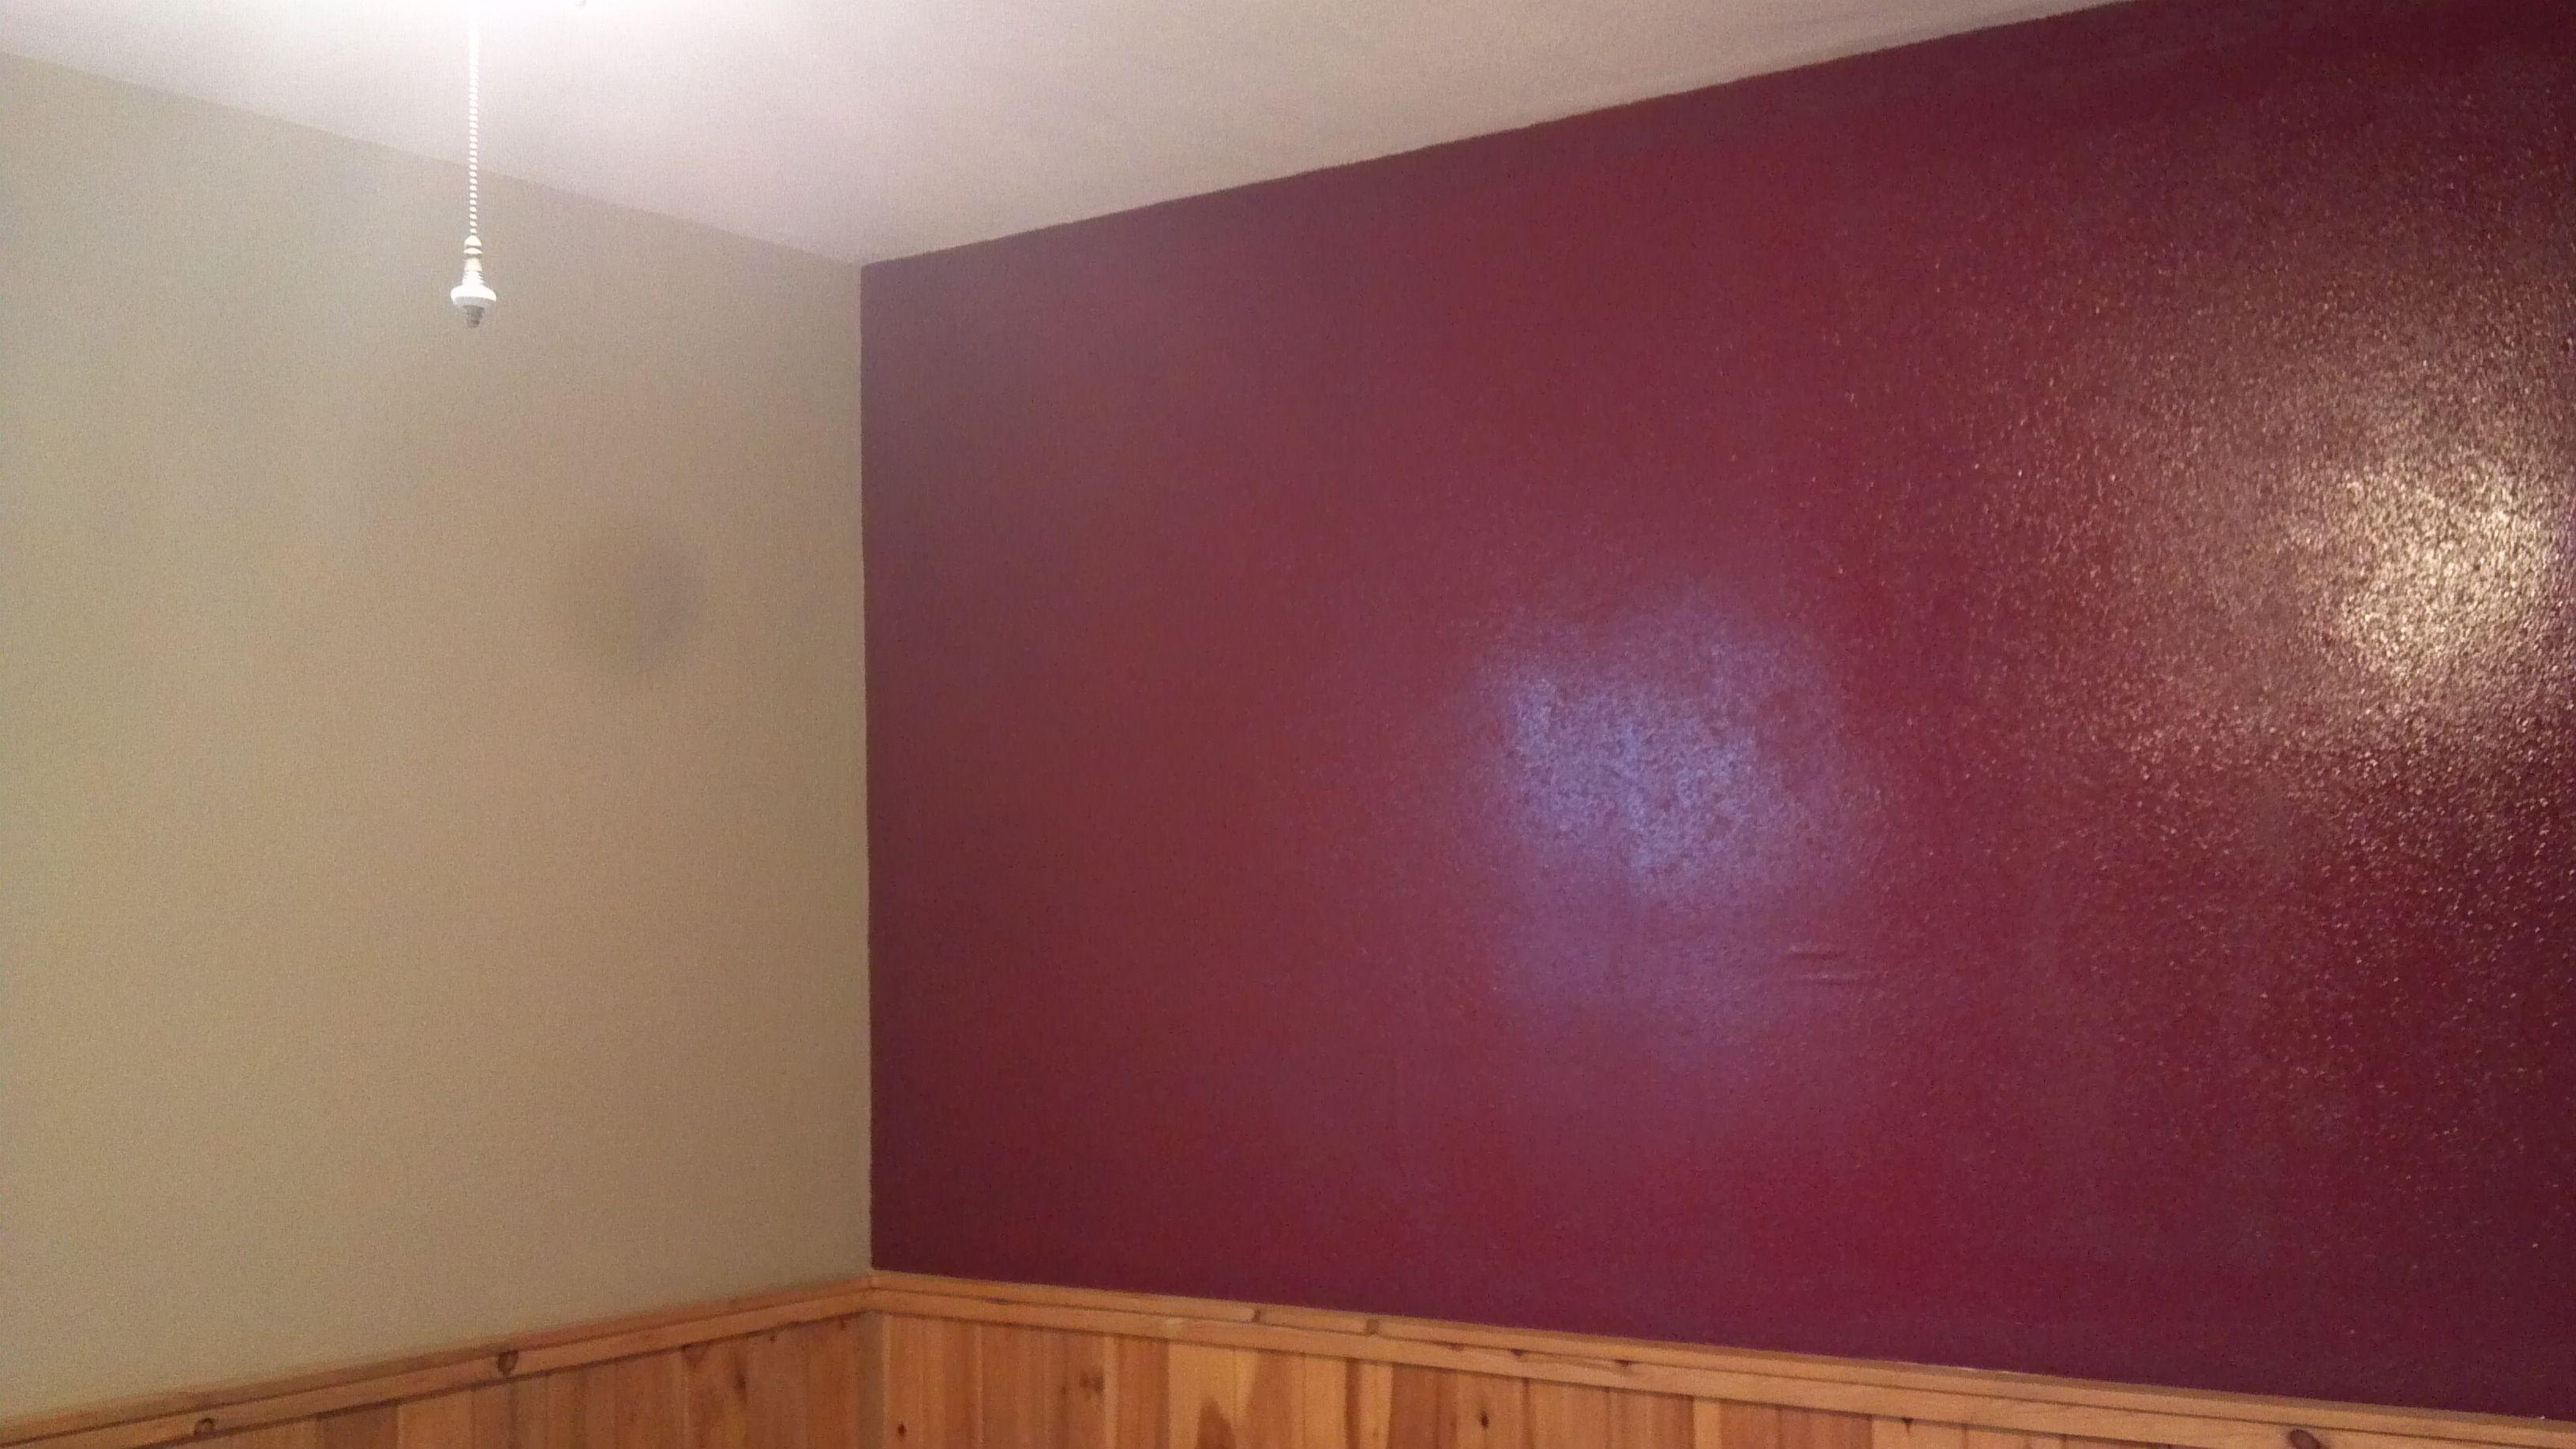 Large Basement Bedroom Repainted Khaki With Burgundy